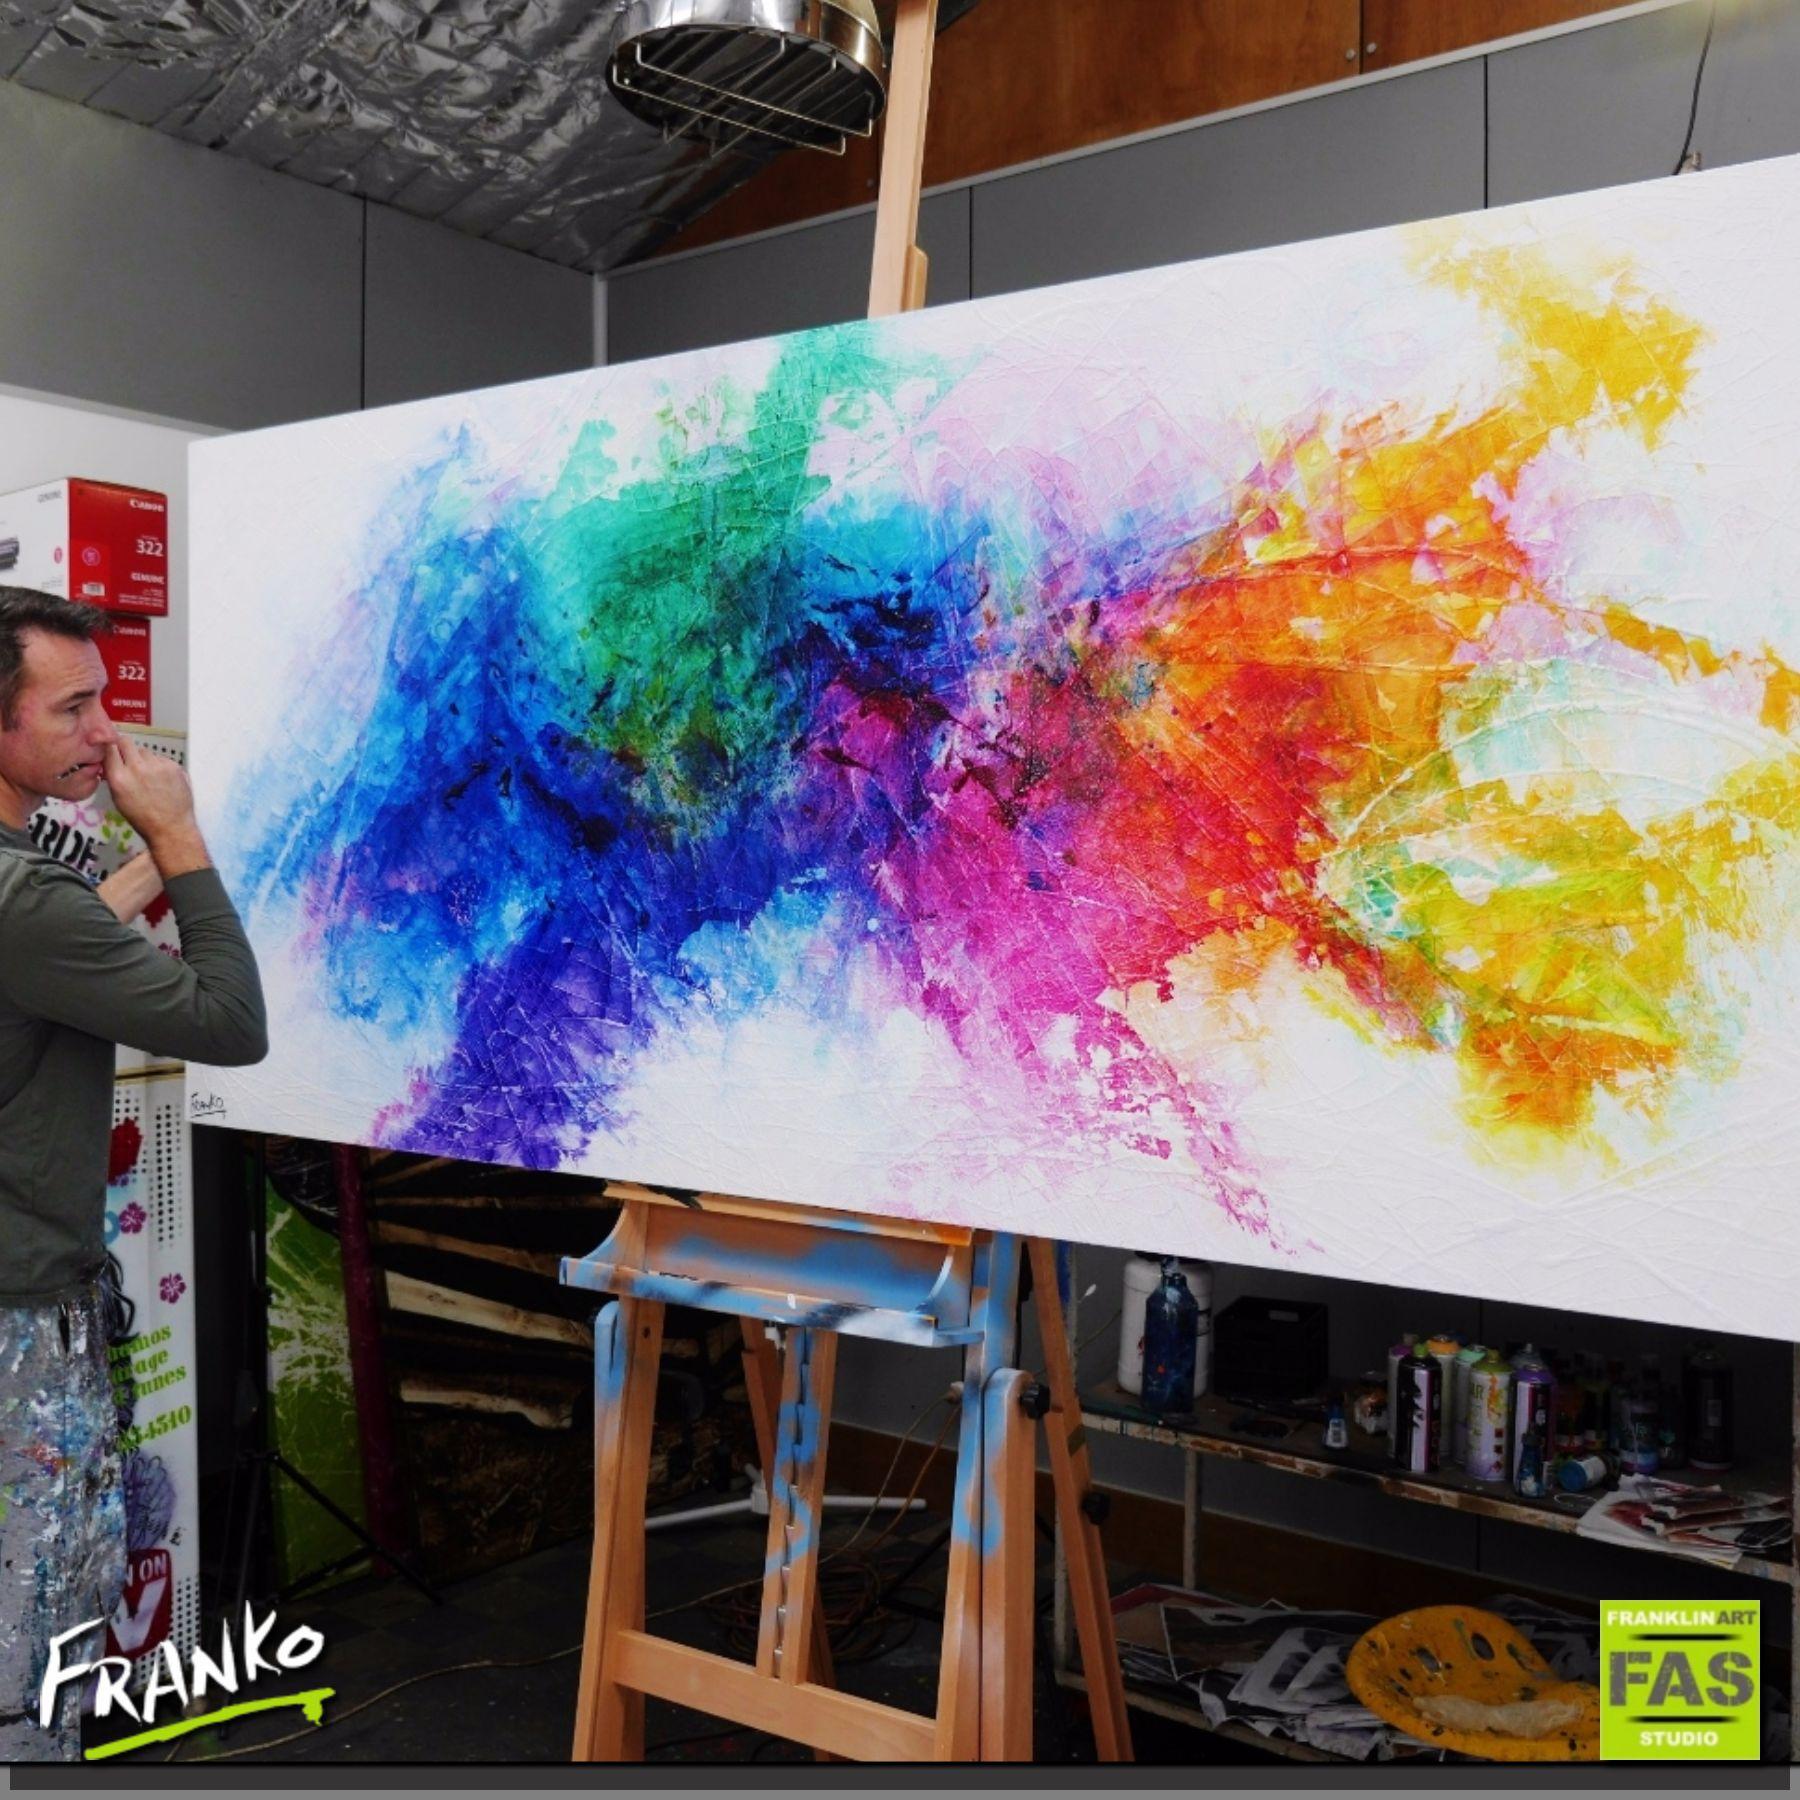 colour-splash-240cm-x-100cm-colourful-sold-linda-abstract-painting-franklin-art-studio-franko-artistzz (1)